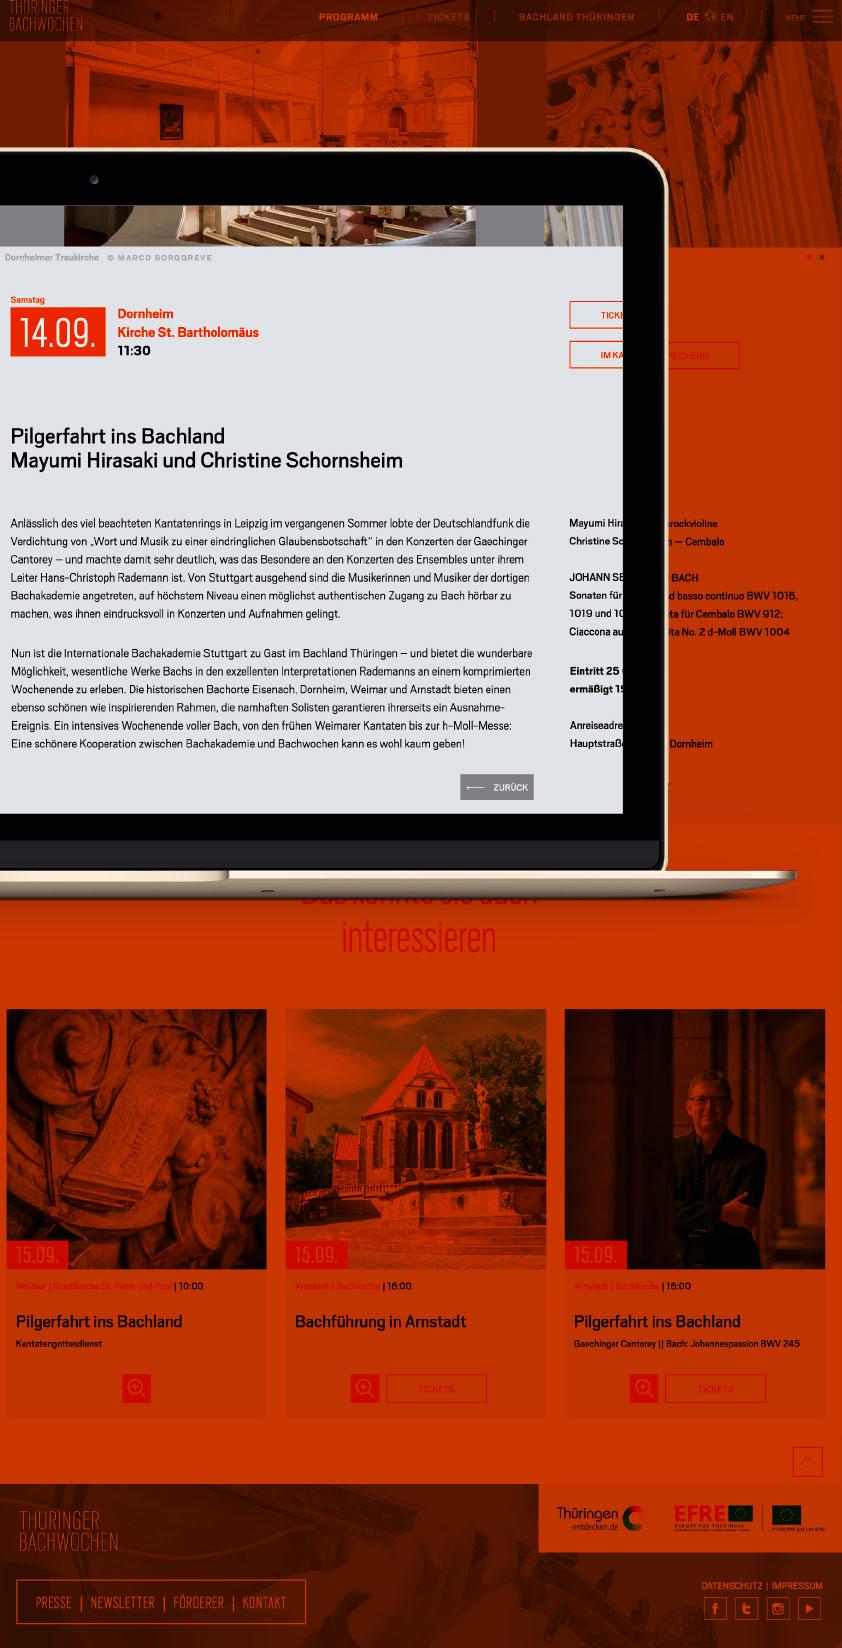 Samt&Seidel_Referenz_Thüringer Bachwochen_Design_03